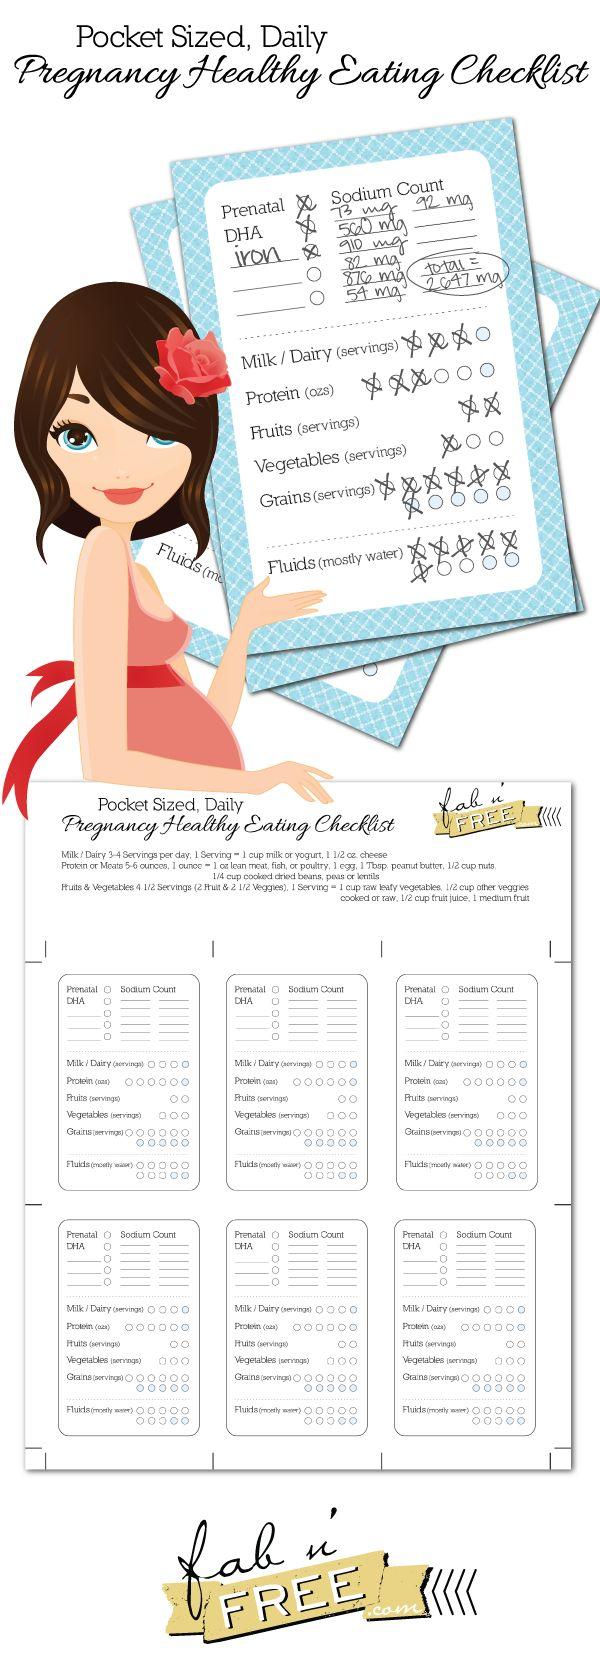 fabnfree.com   Pocket Sized Daily Pregnancy Healthy Eating Checklist Free Printable